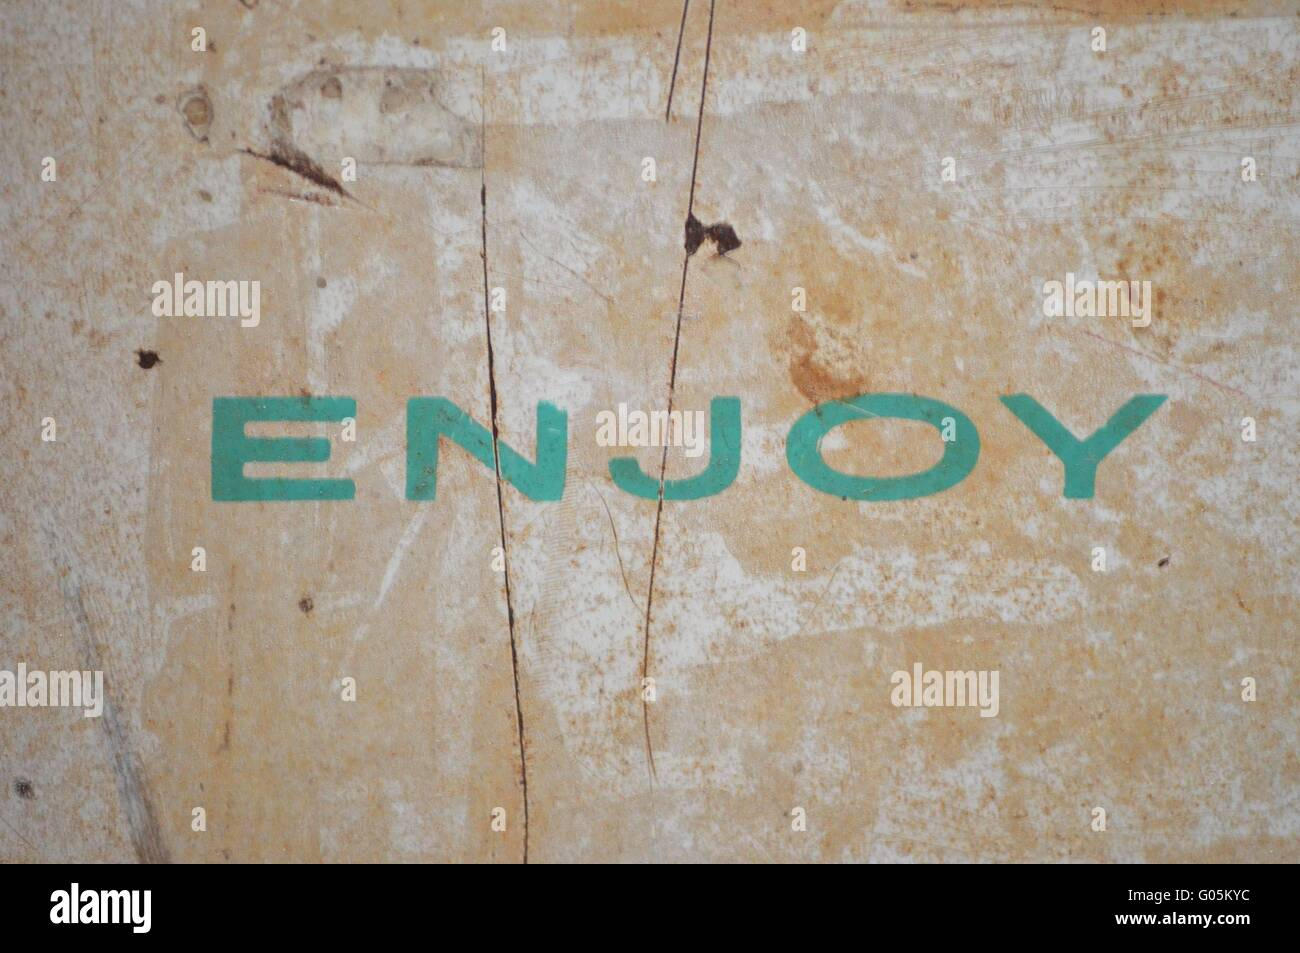 The word Enjoy written in turqoise on old metal - Stock Image